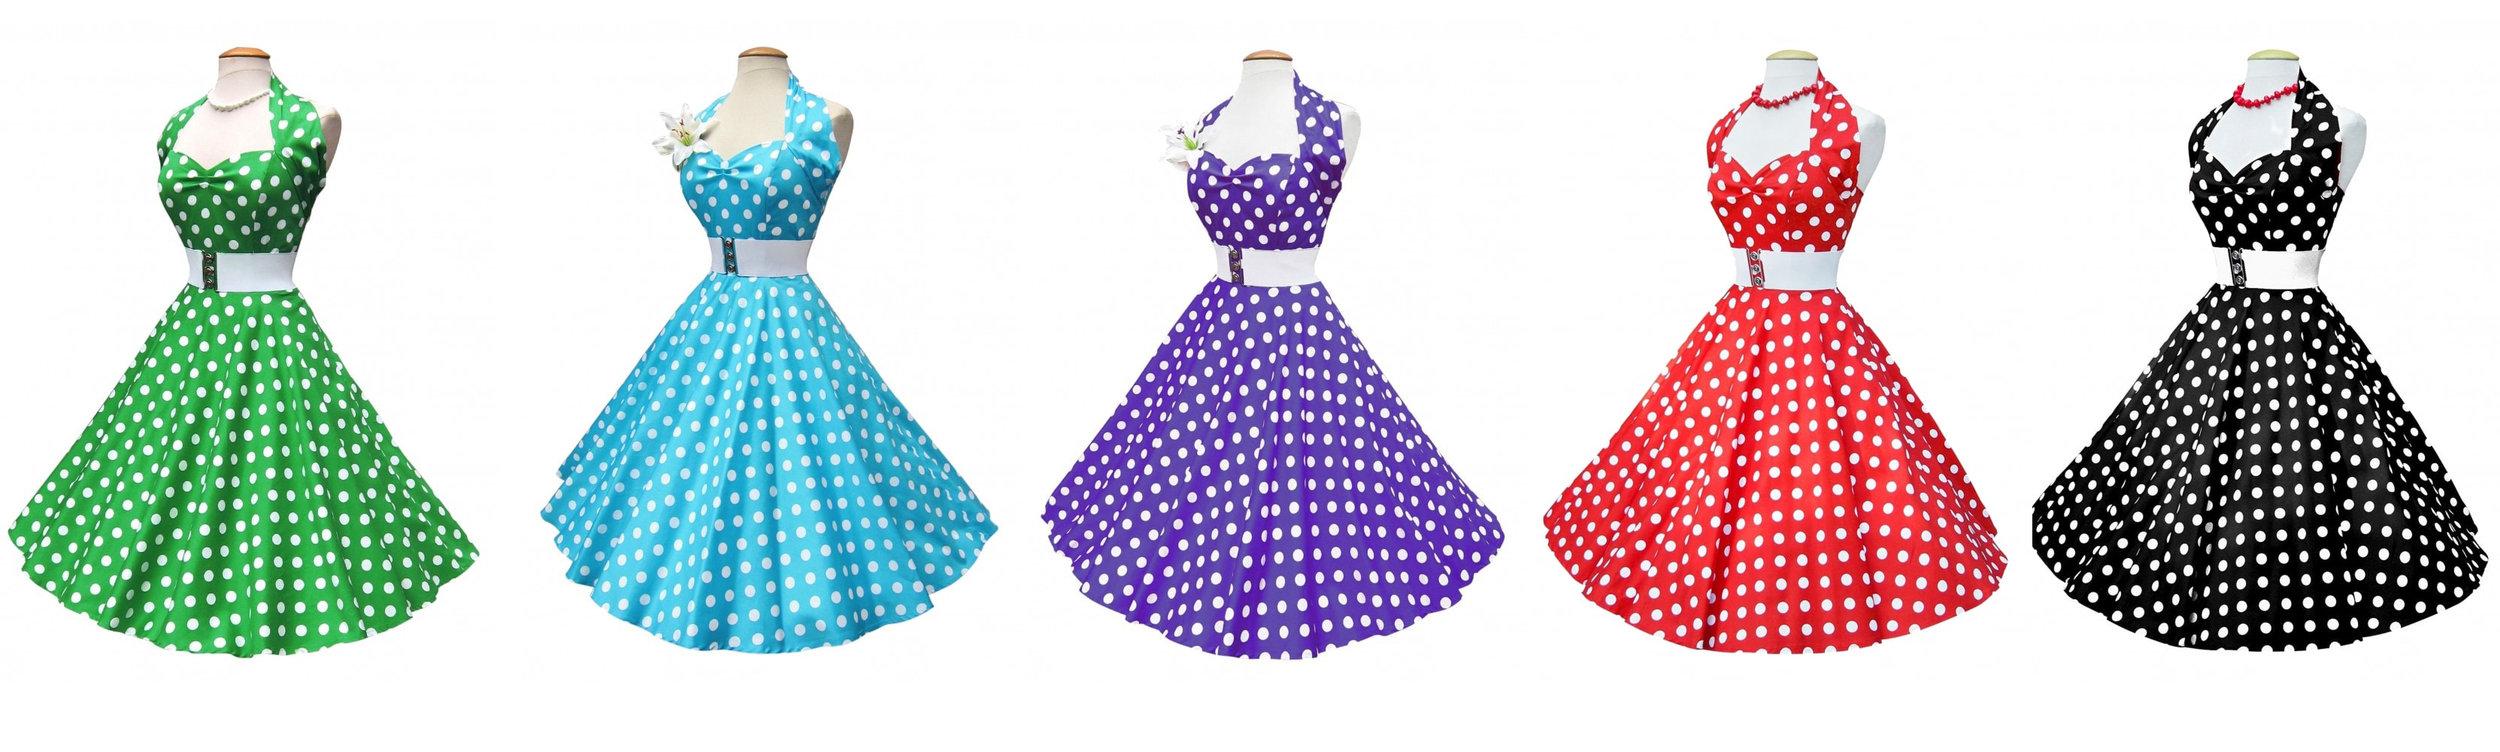 Polka dot dresses from  Vivien of Holloway